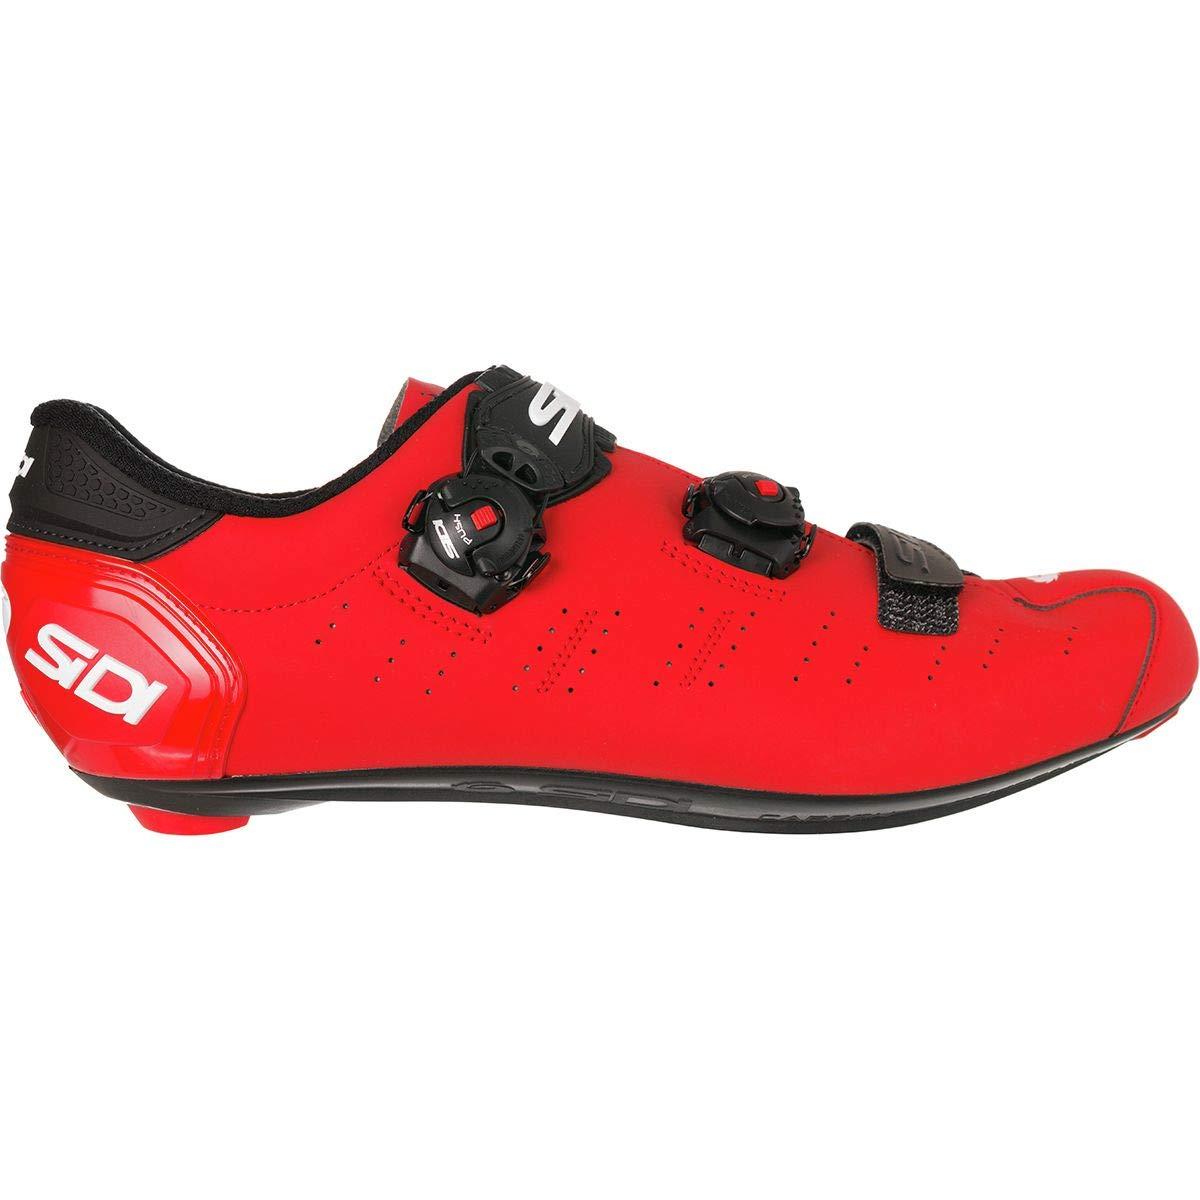 SIDI(シディ) ERGO 5 MATT RED/BLK 43.5 26.75cm相当 ビンディングシューズ   B07HR9BNY3